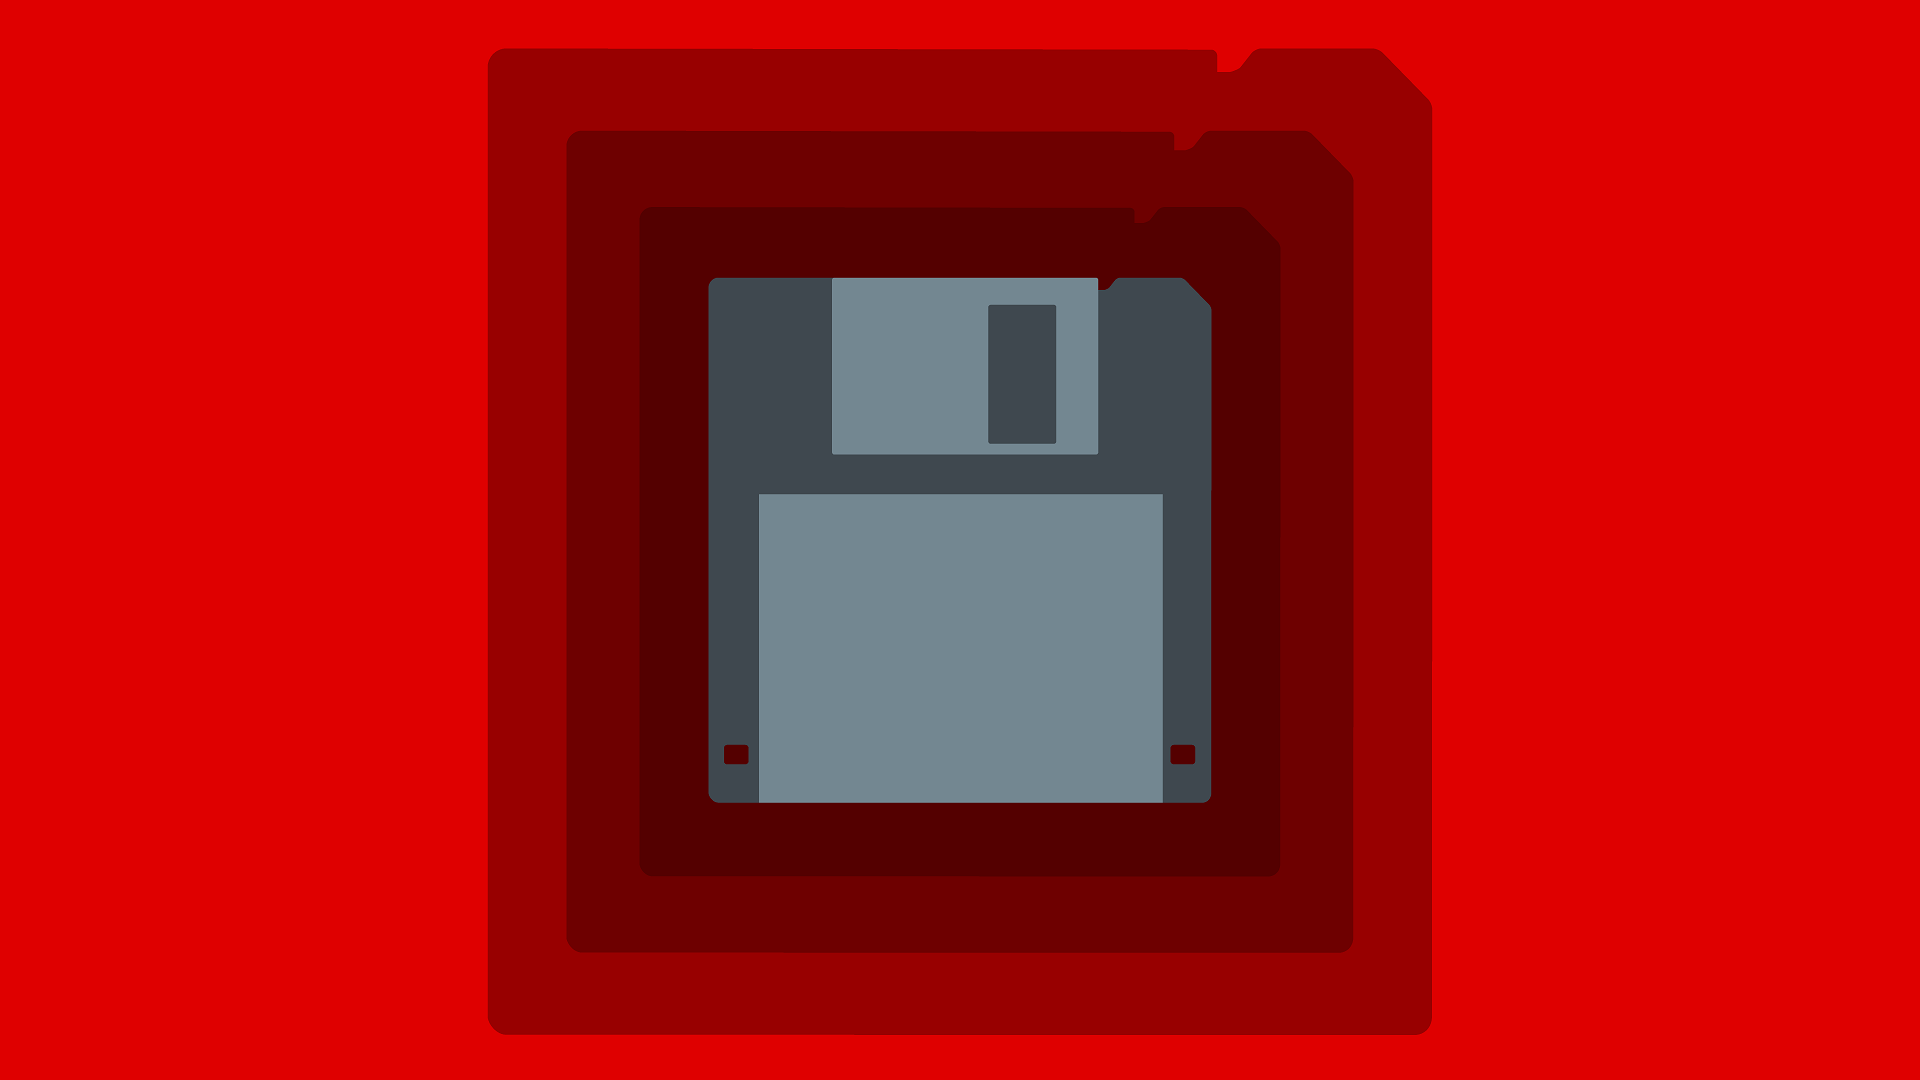 quicksave banner no text 1080p